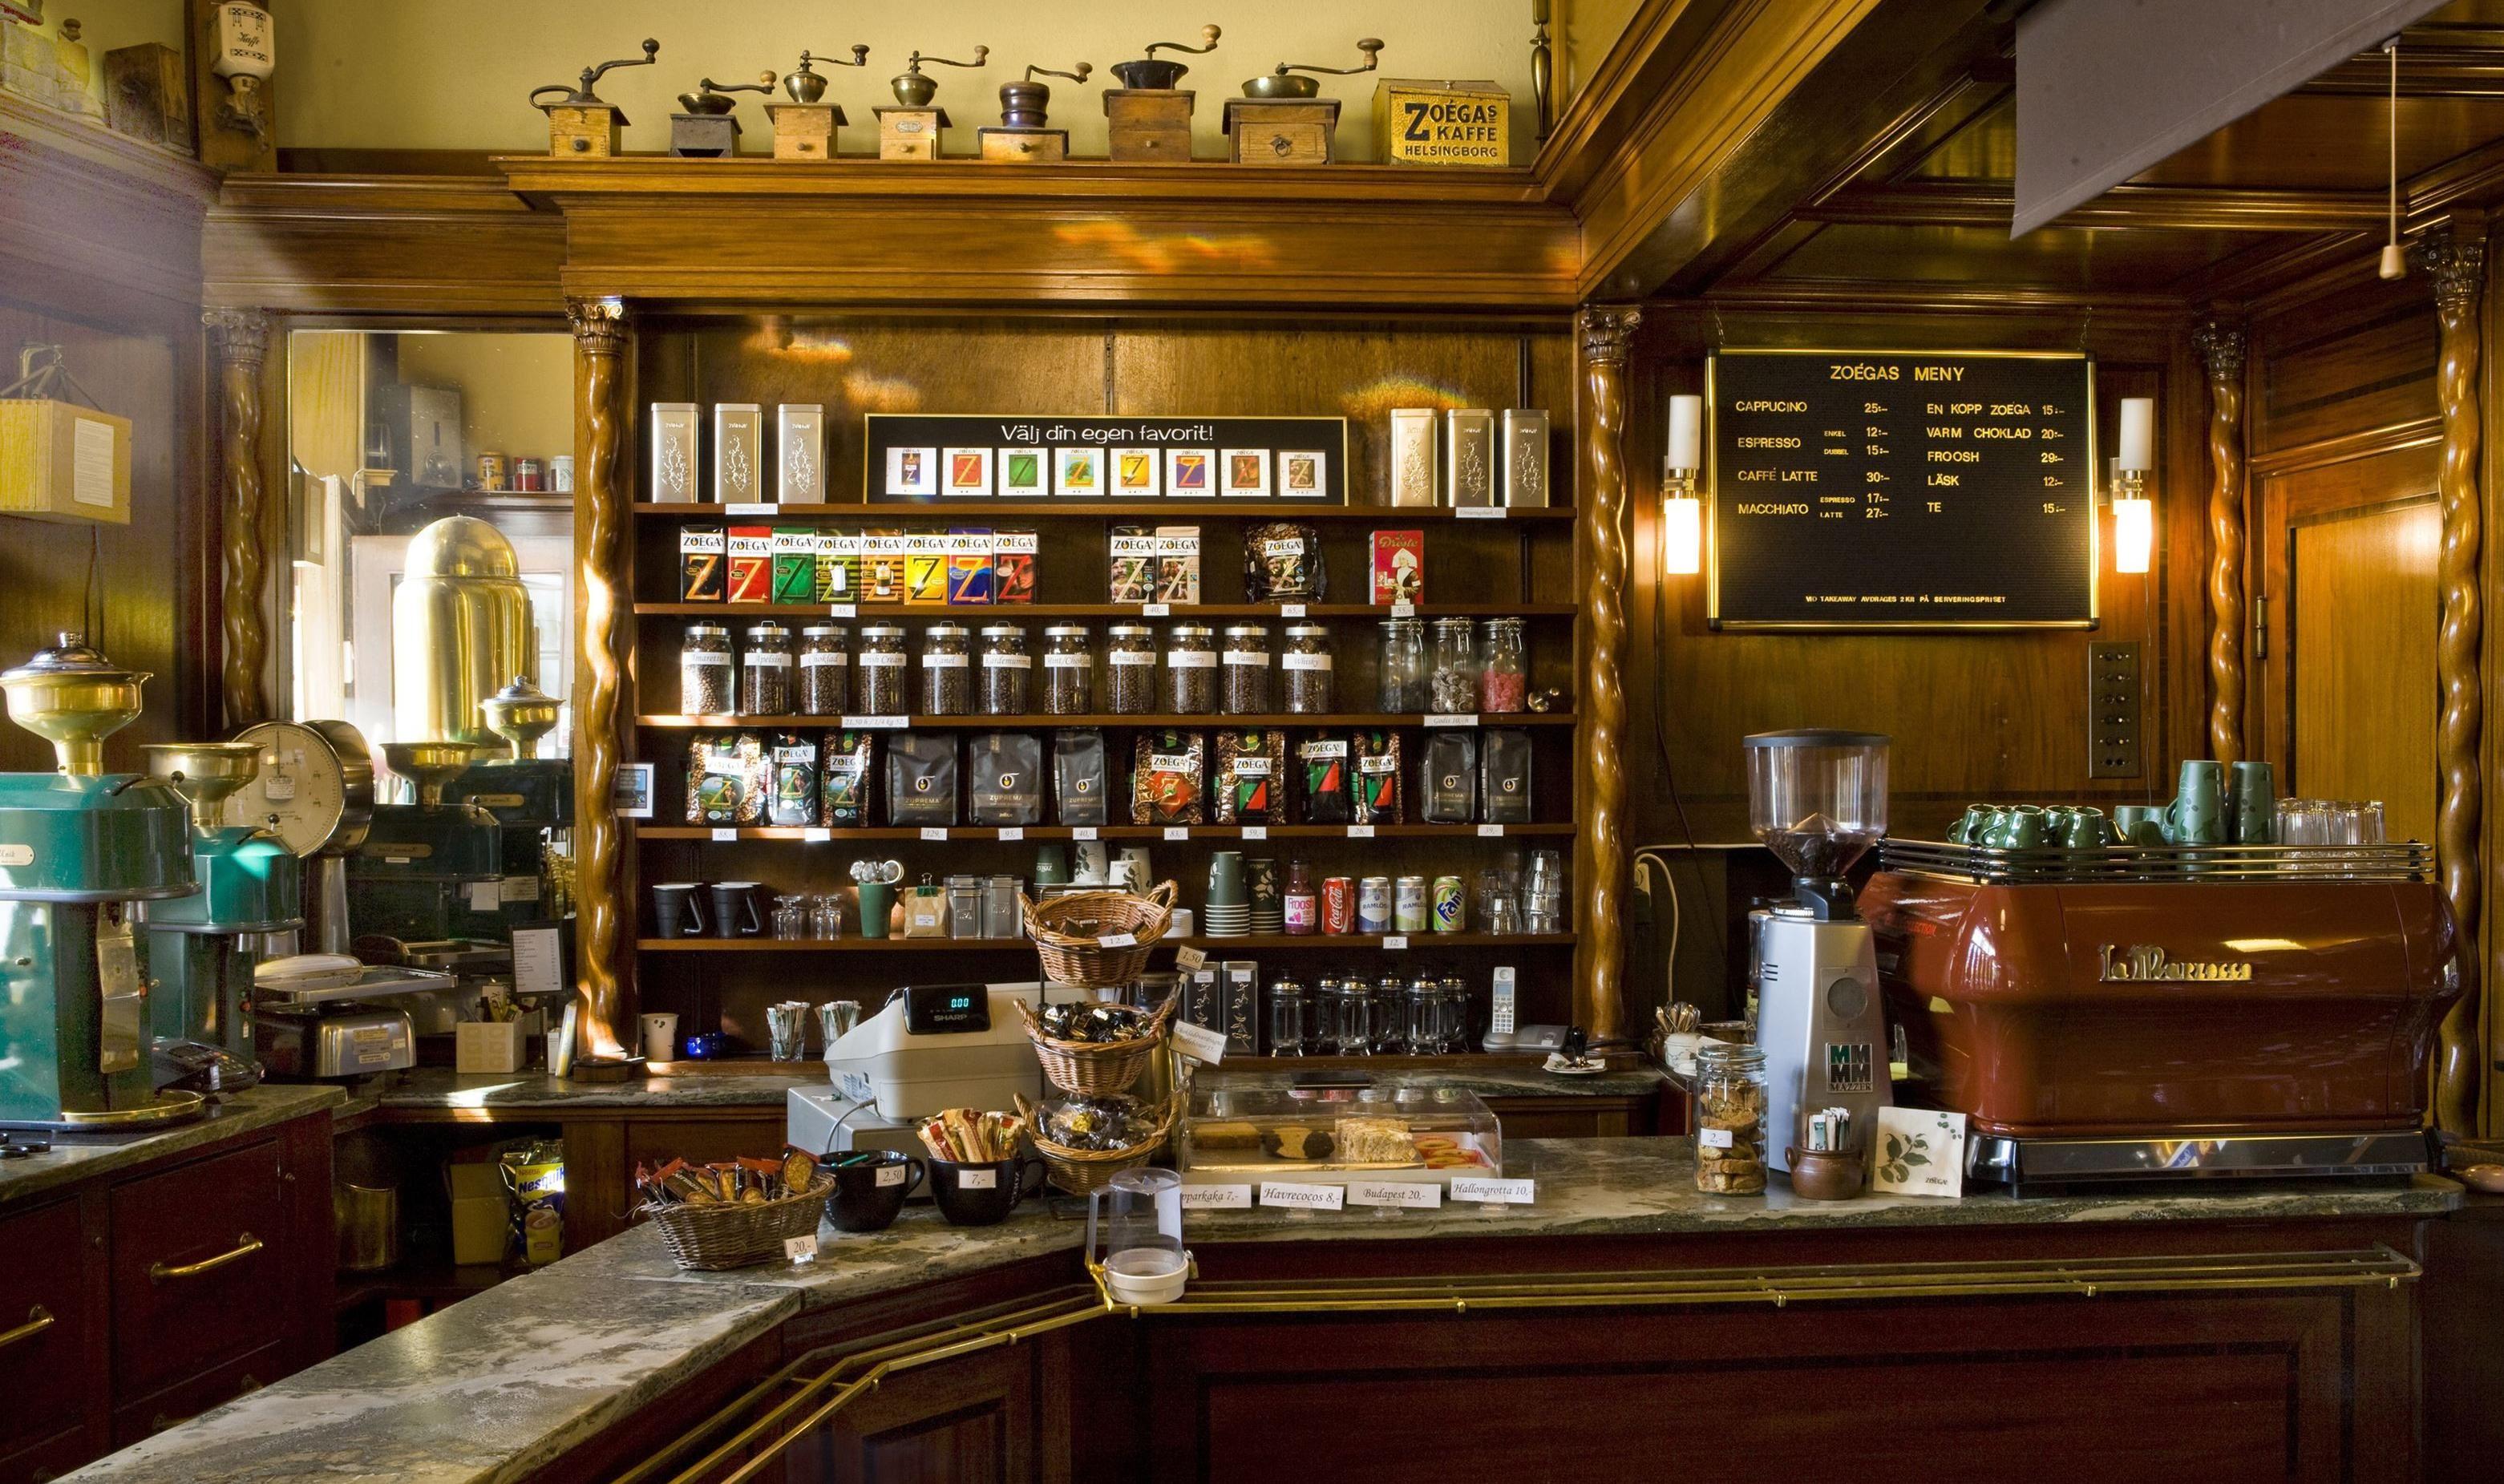 ZOÉGAS Café och Butik